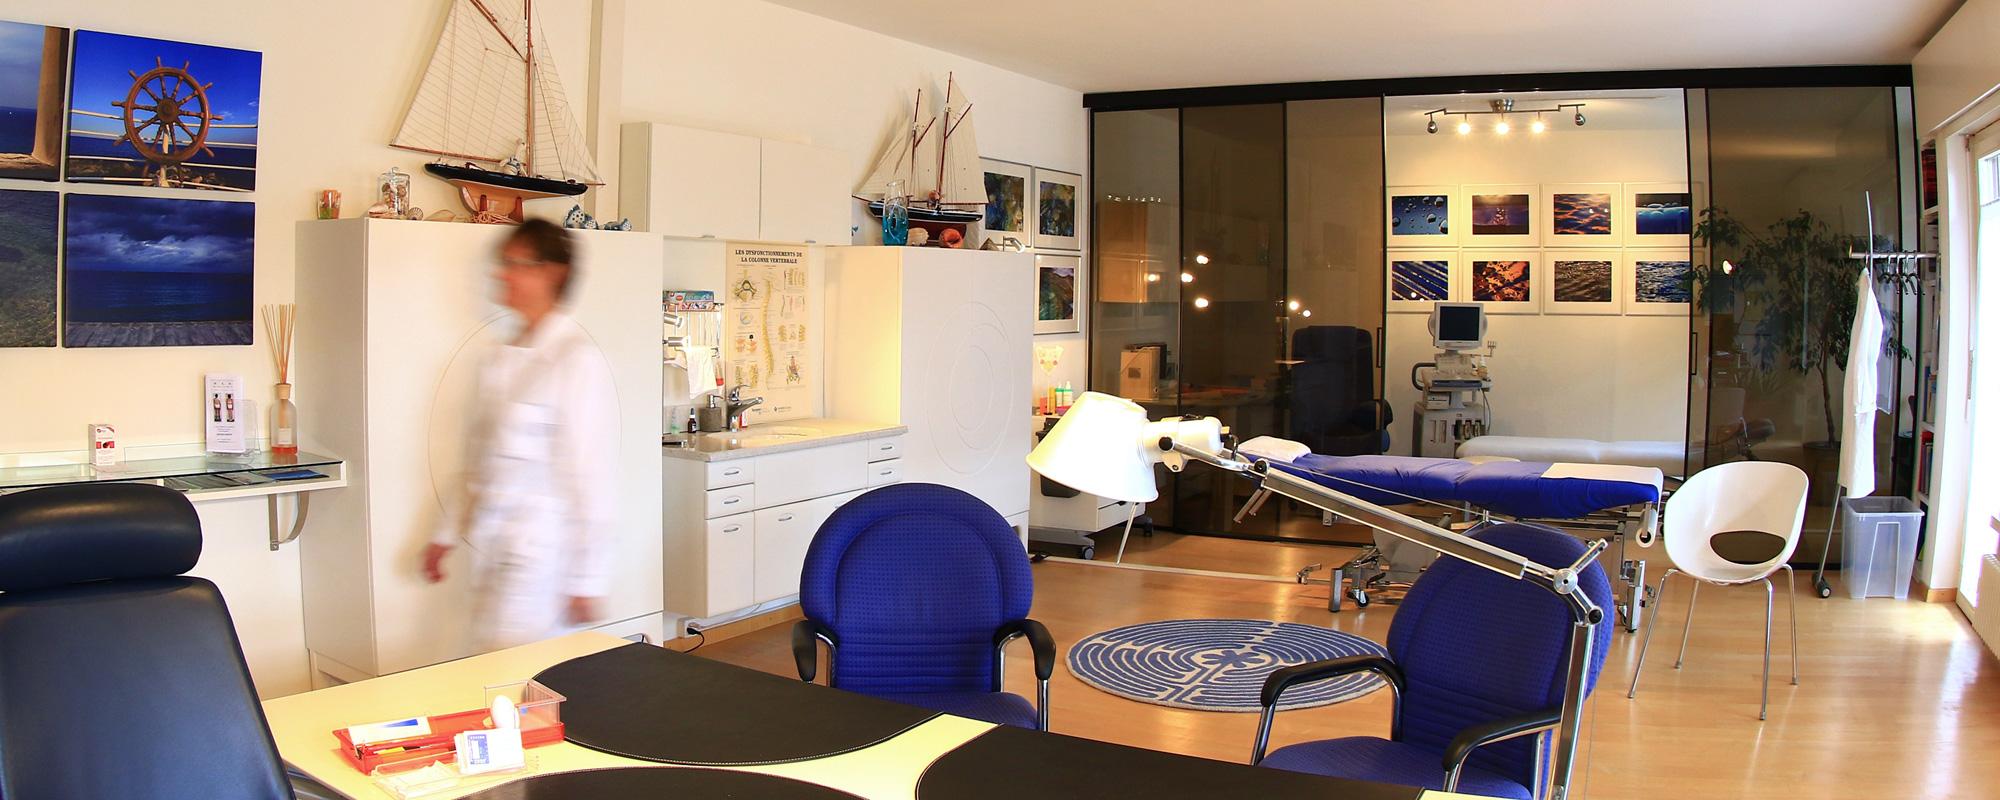 Studio Medico Schütz<p><b> FMH Medicina Fisica e Riabilitazione</b></p>